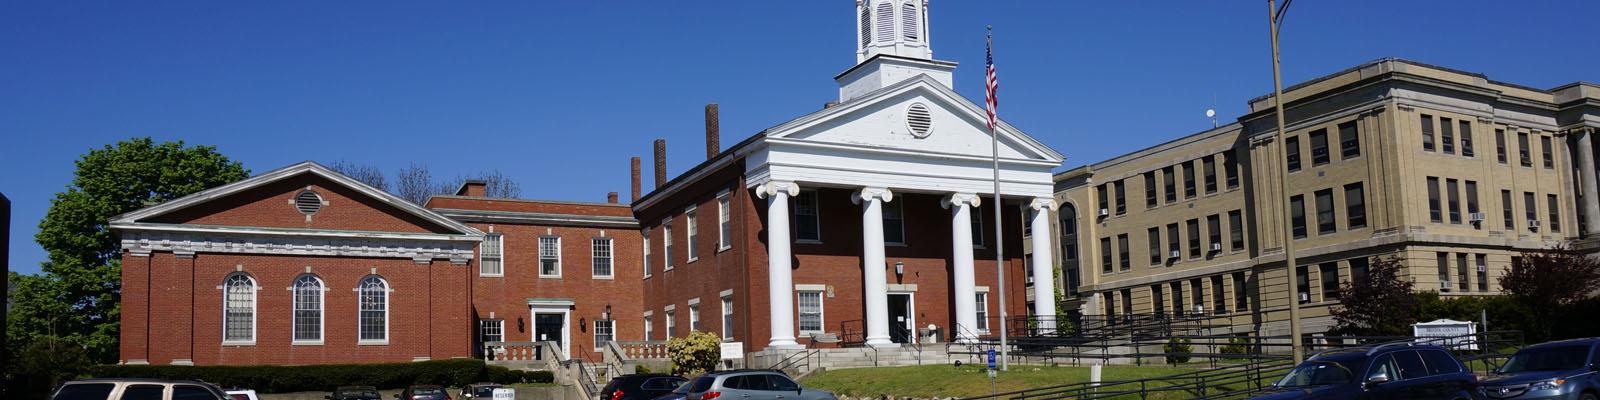 Bristol County Superior Court-New Bedford | Mass gov